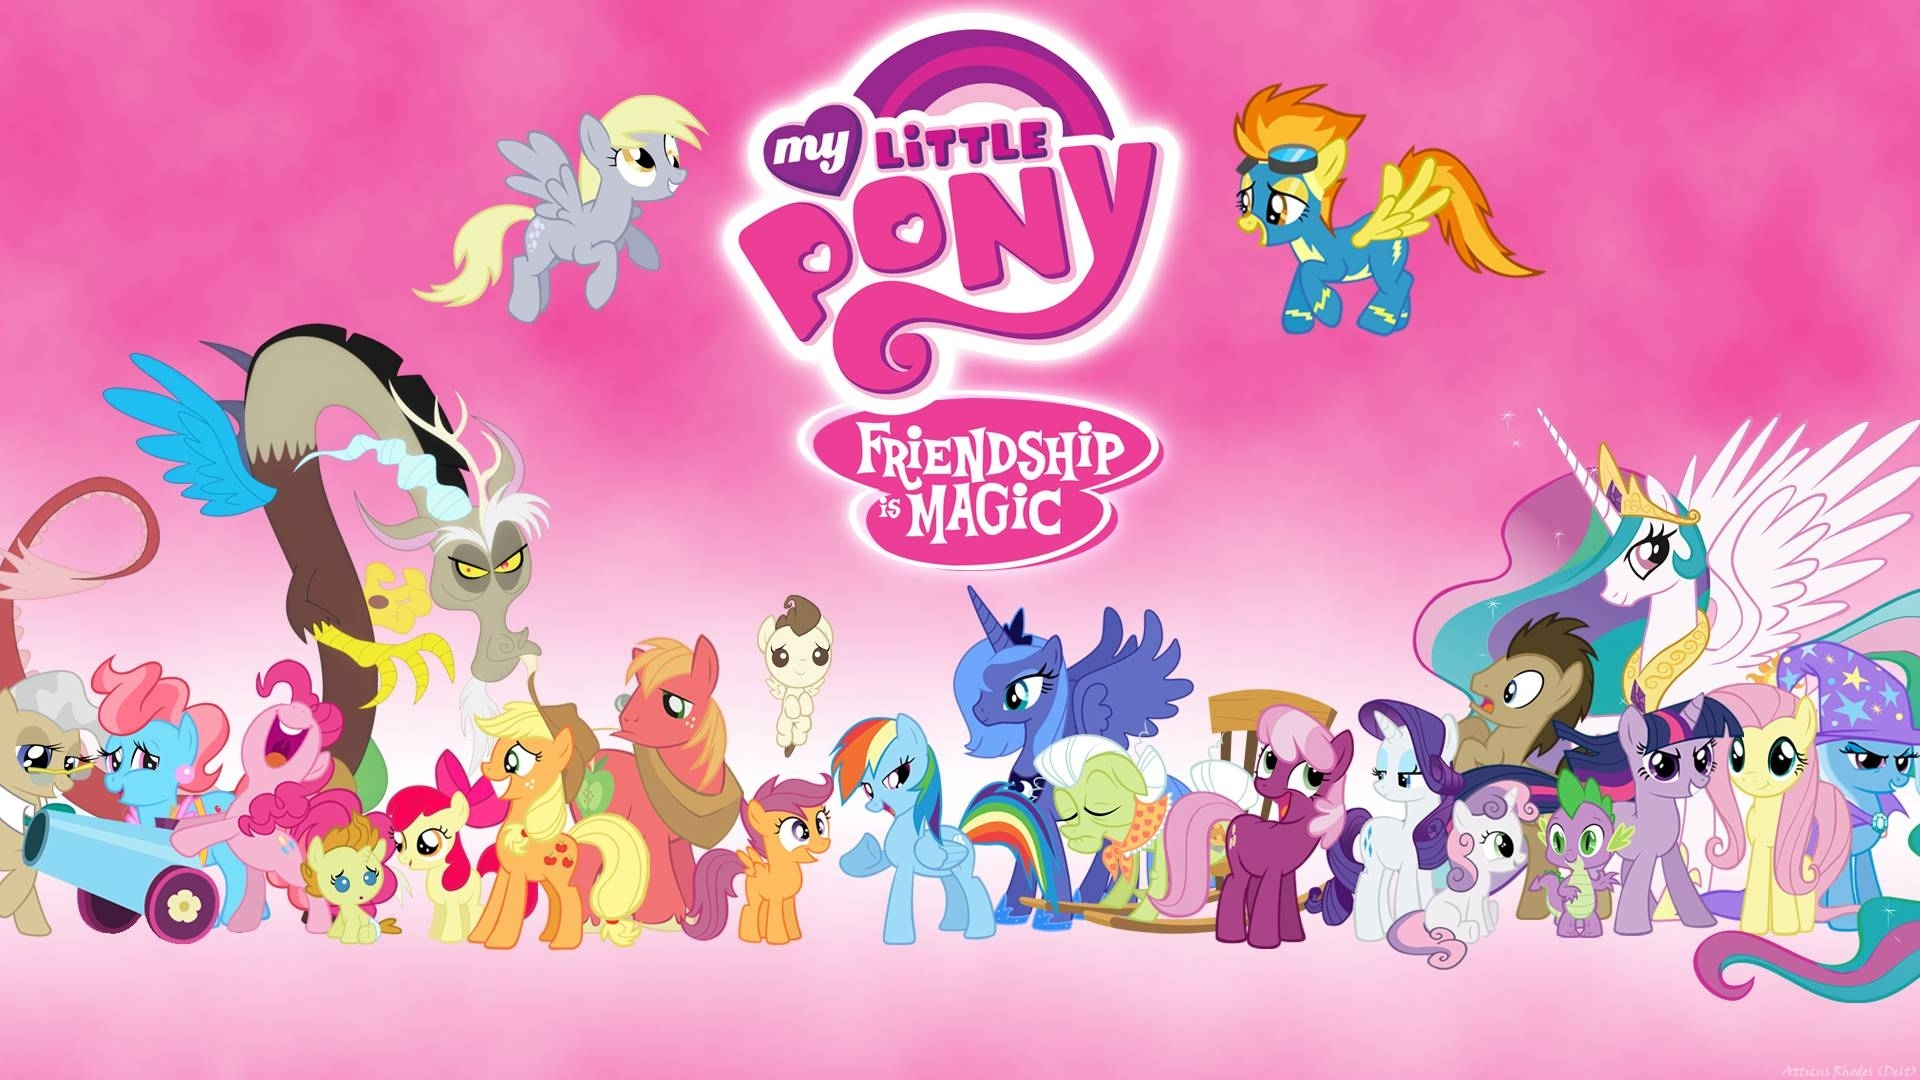 my little pony wallpaper - bdfjade